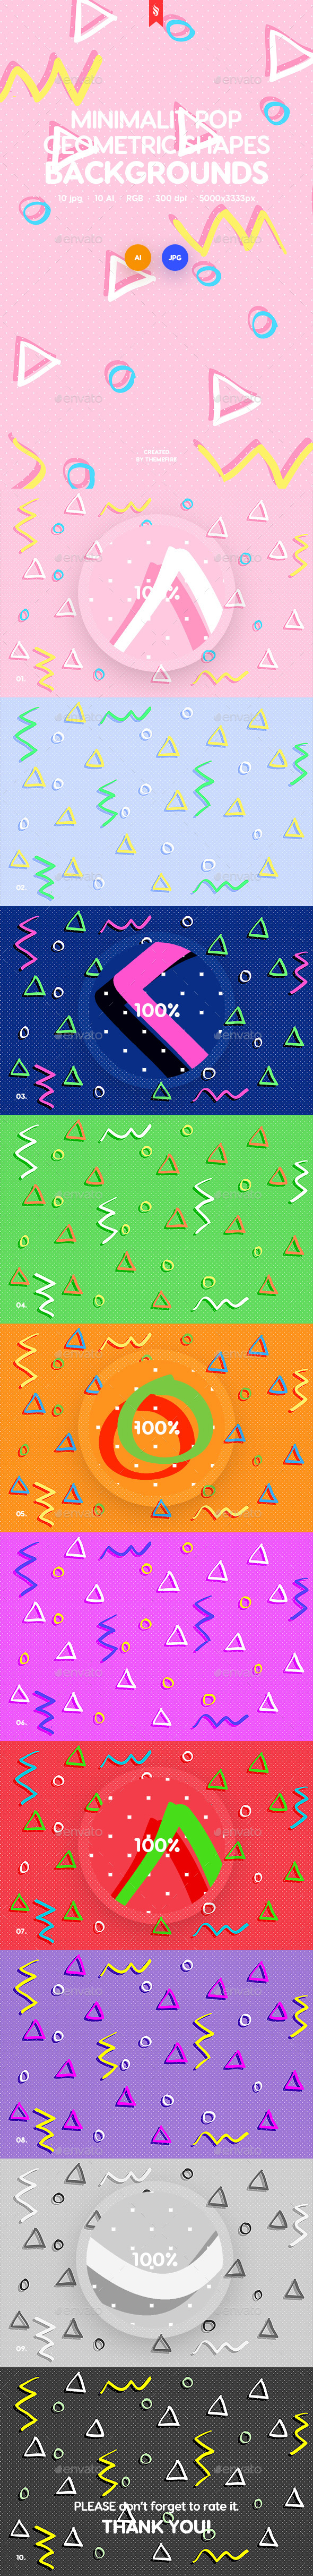 Minimalist Pop Geometric Shapes Backgrounds - Patterns Backgrounds